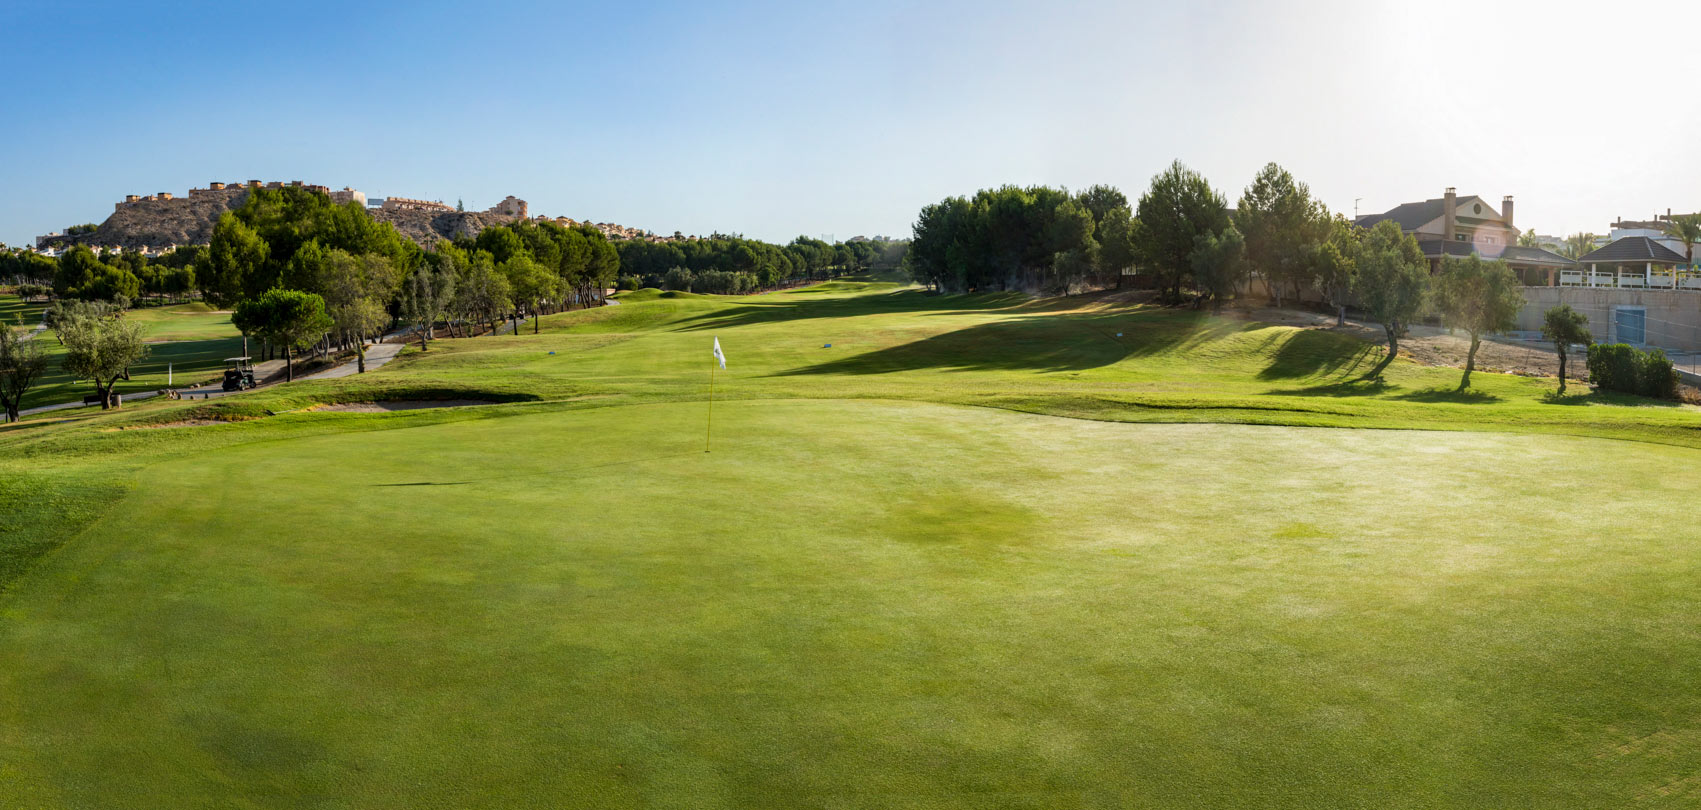 Escuela de golf, academia de adultos, cafetería, restaurante, gimnasio